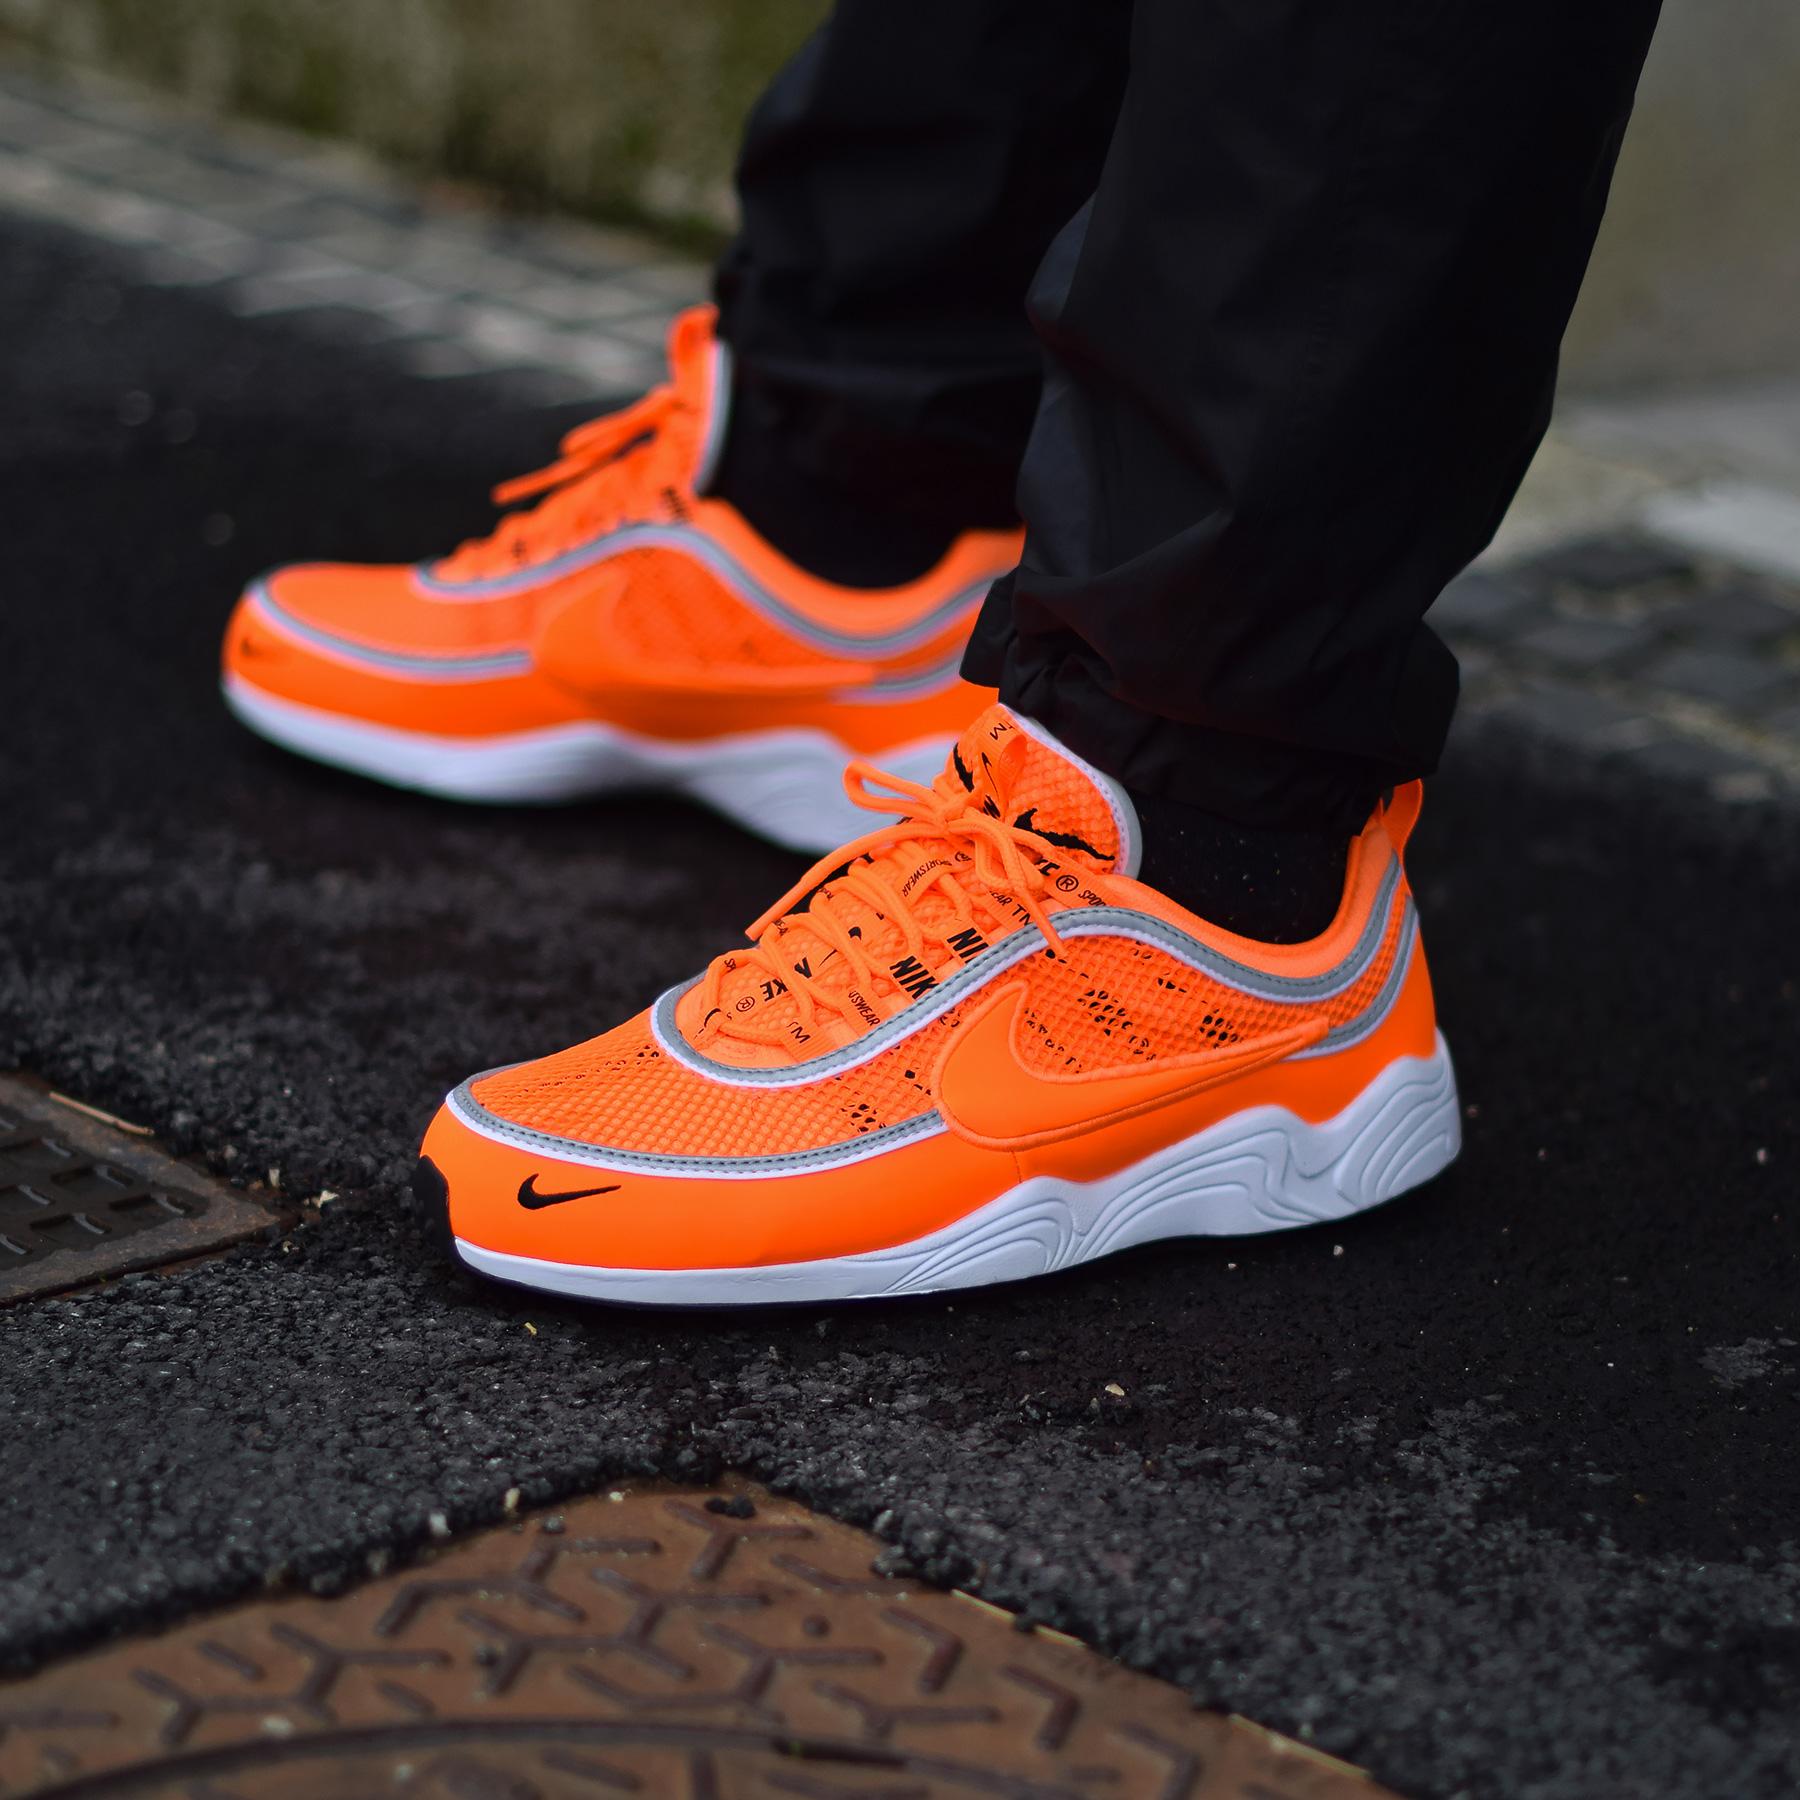 Nike Air Zoom Spiridon '16 « Overbranding »